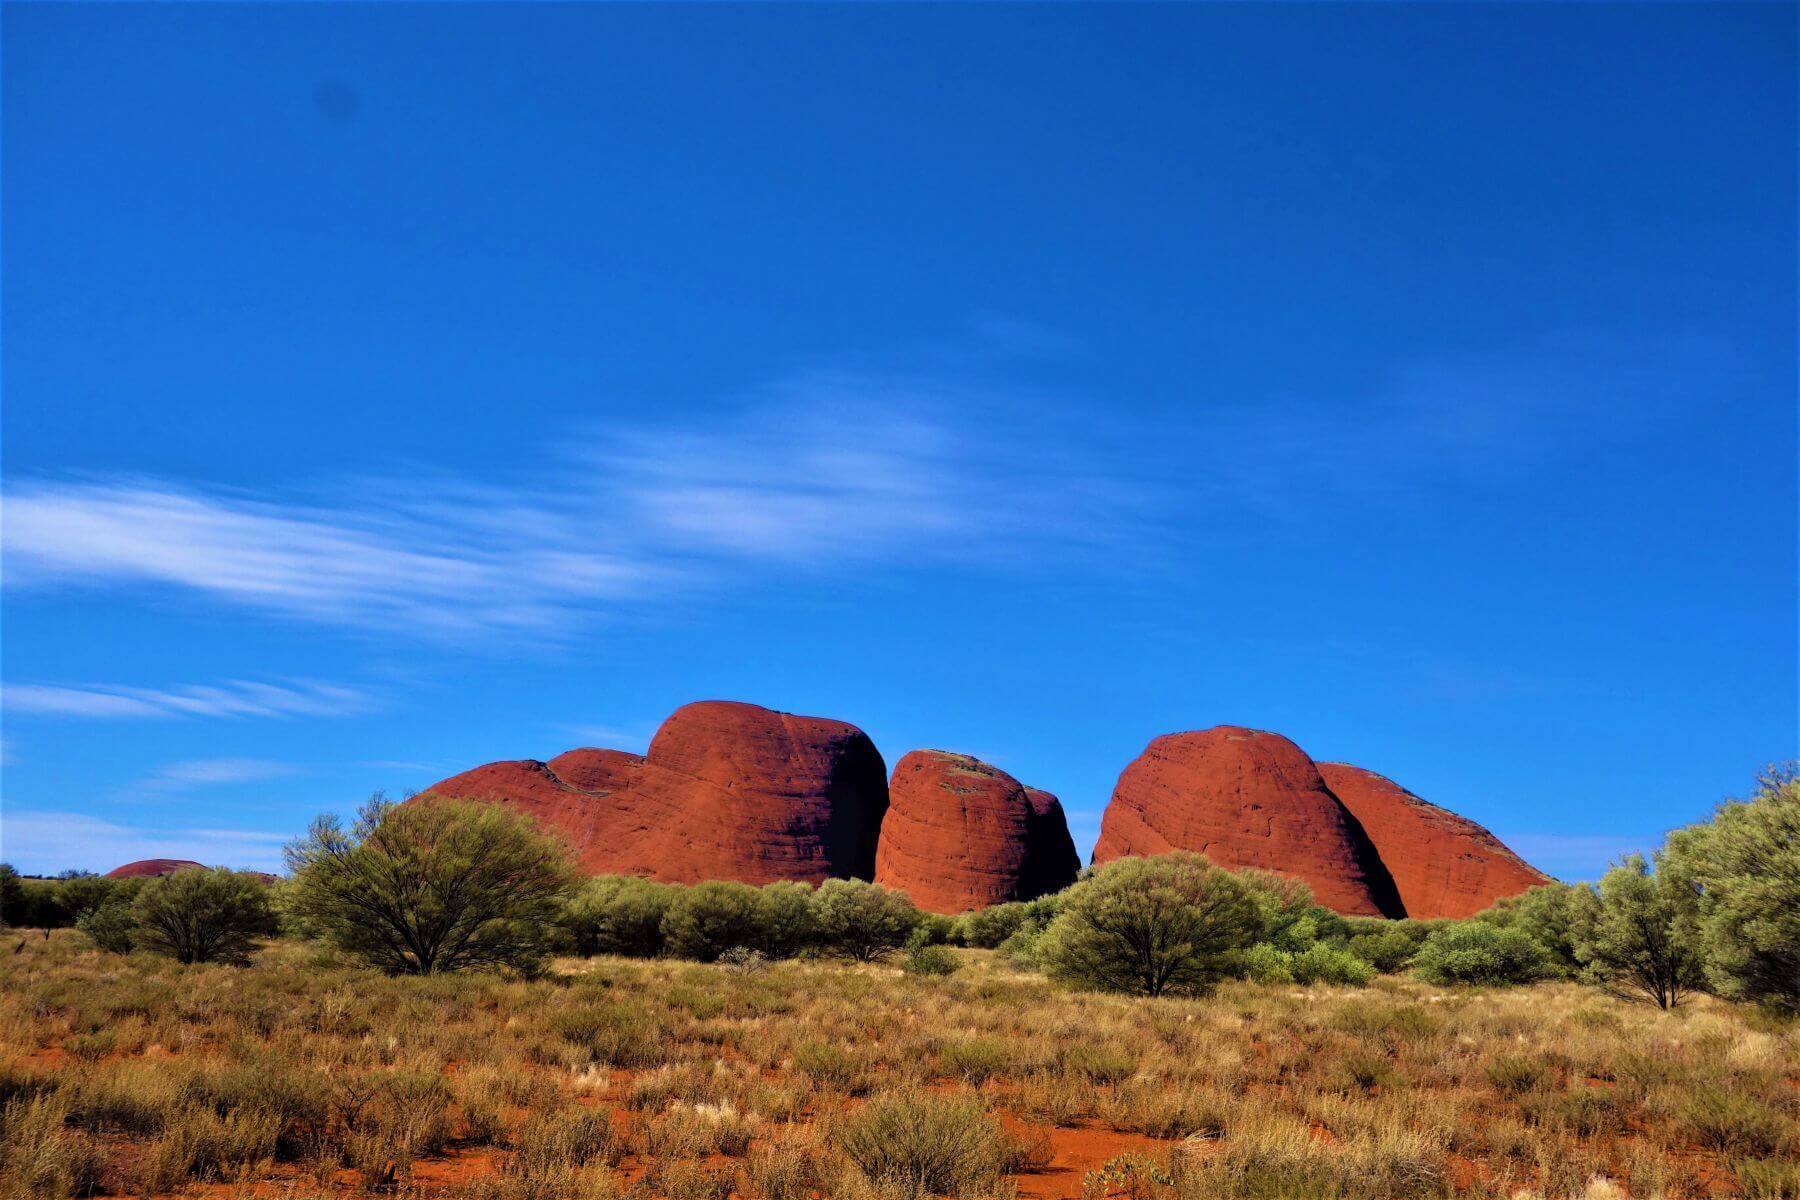 Rote Felsformation Olgas Rock im Uluru-Kata Tjuta National Park